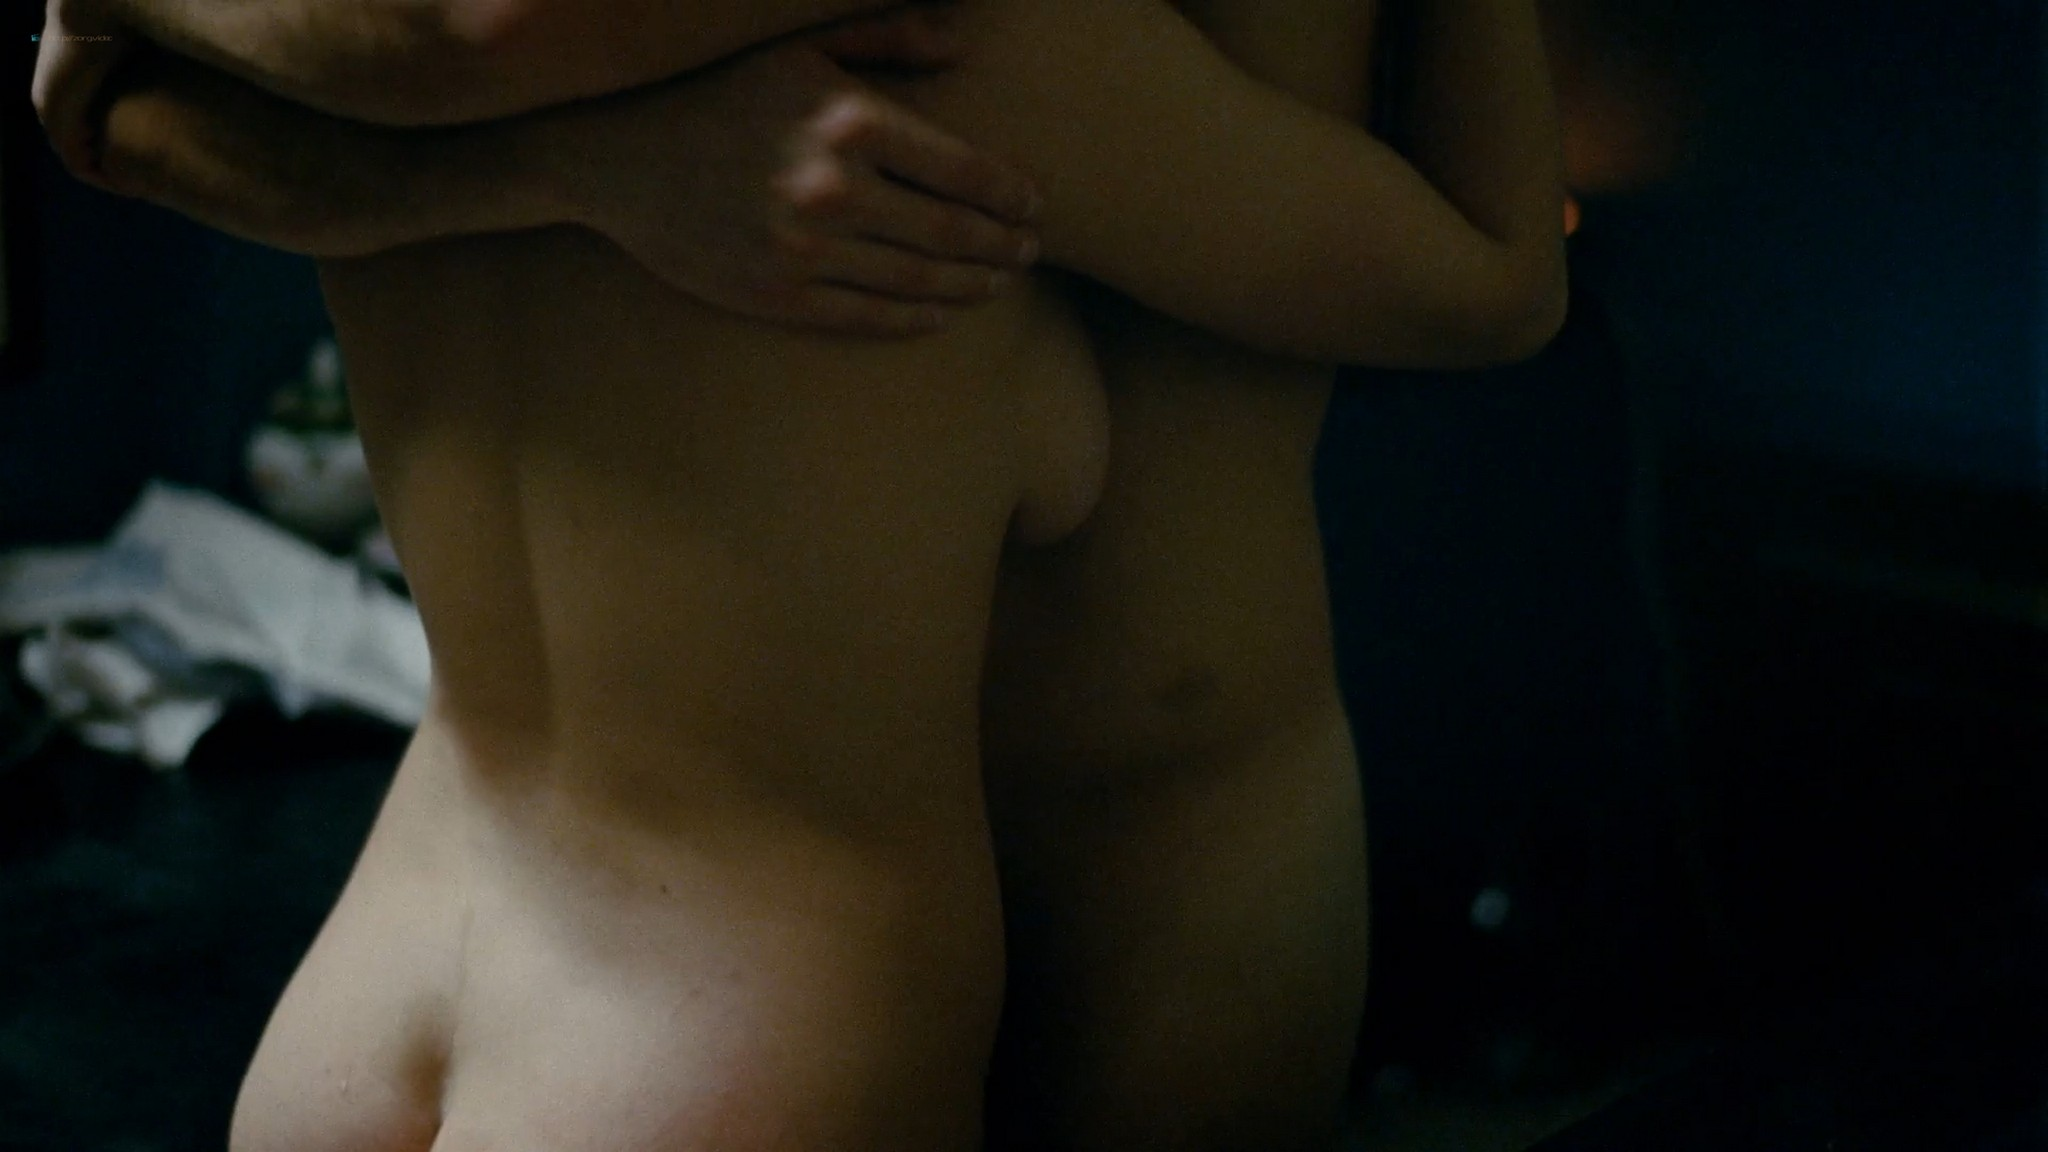 Kristina Babich nude sex Viktoria Skitskaya, Kristina Voloshina nude too- DAU Degeneratsiya (2020) HD 1080p (4)